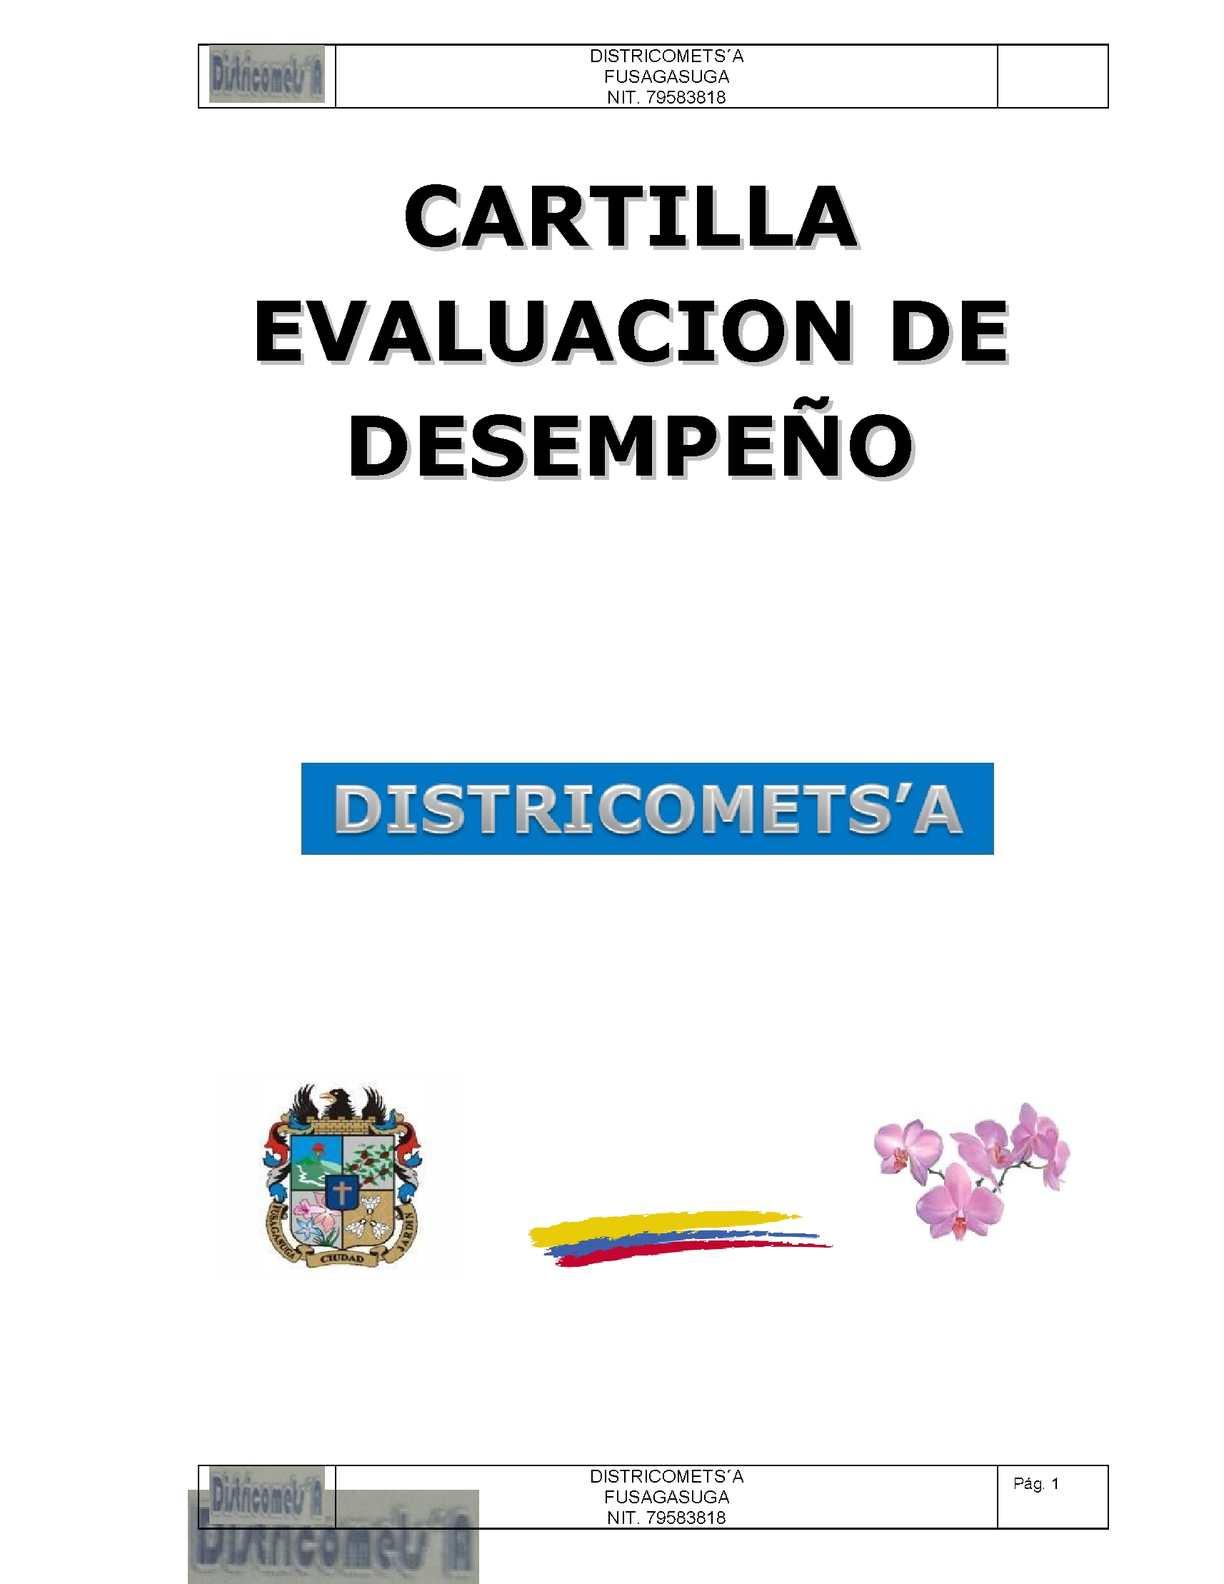 Calaméo - Cartilla Evaluacion De Desempeño